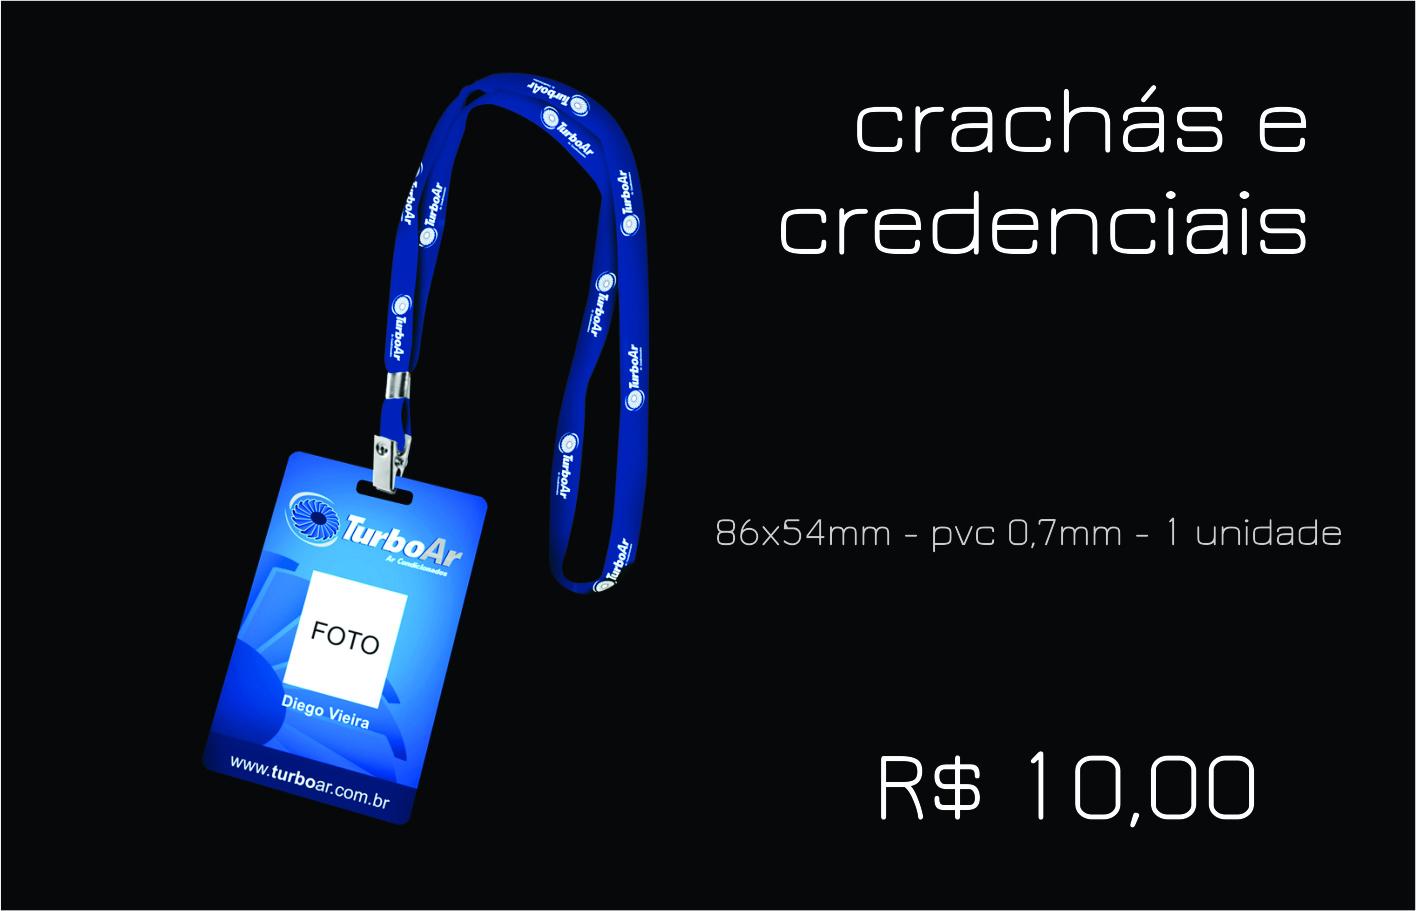 cracha.jpg